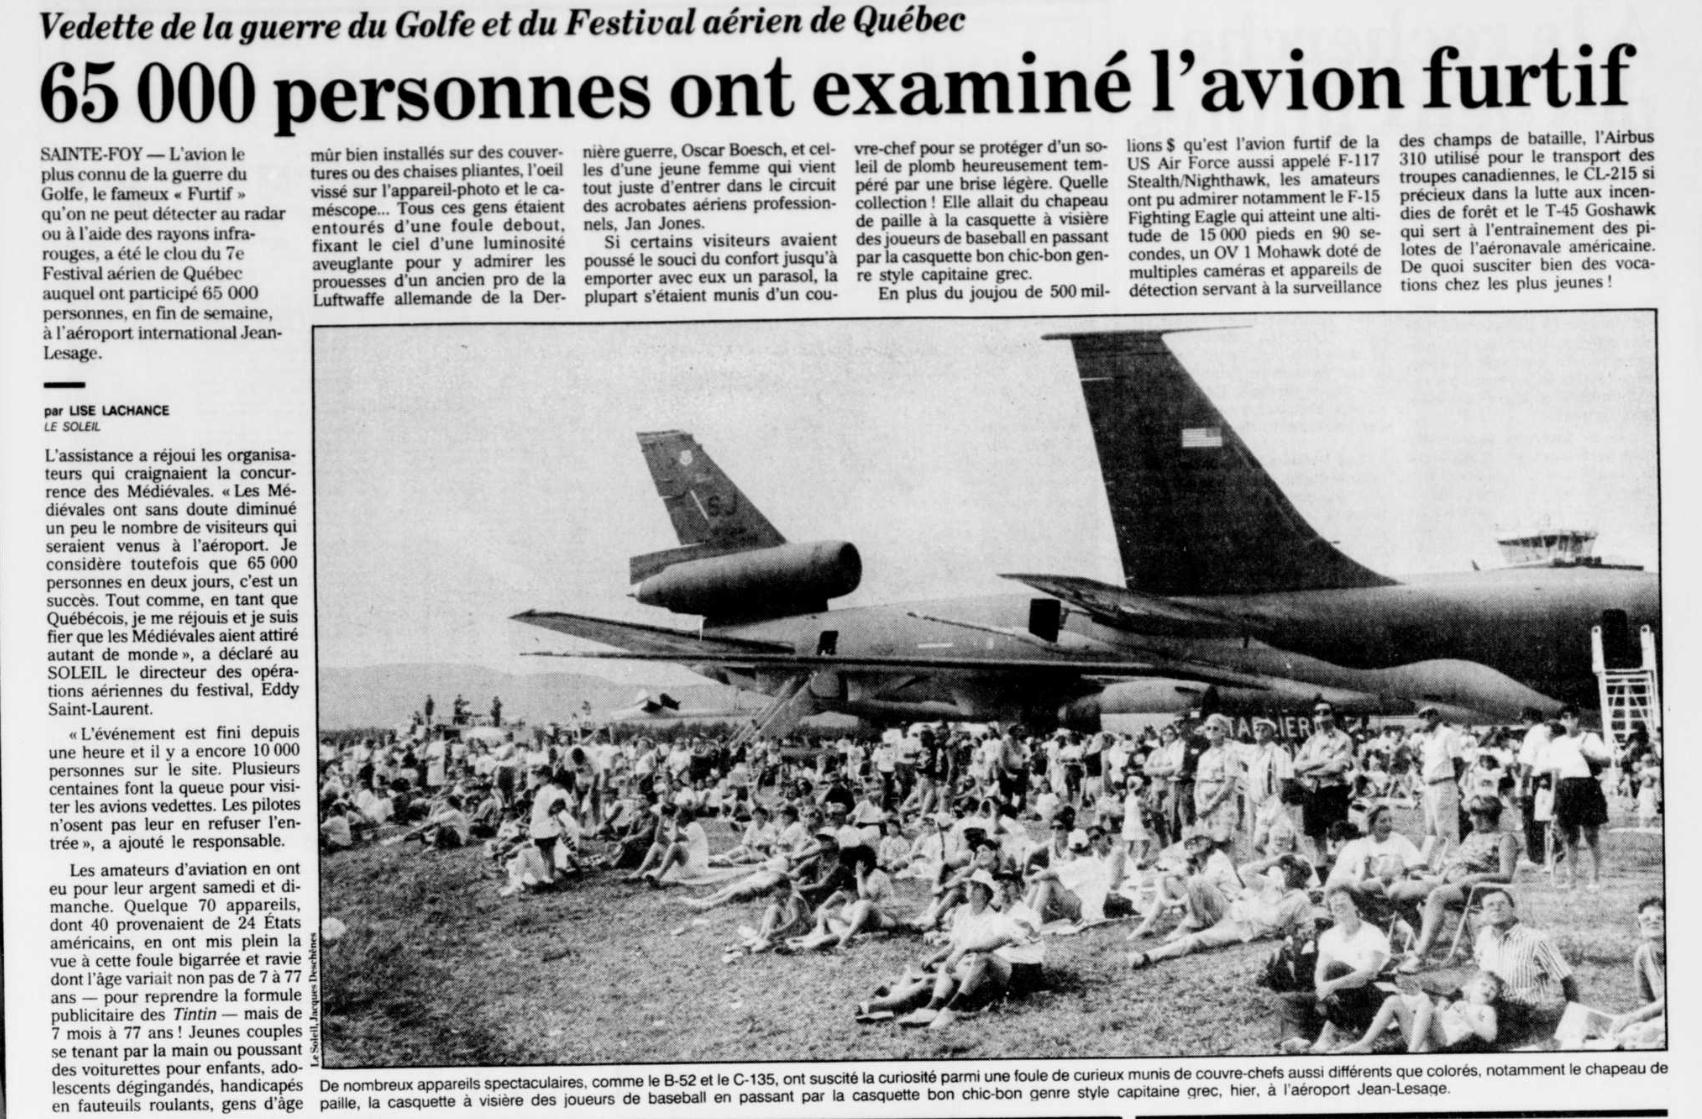 Journal Le Soleil 16 août 1993